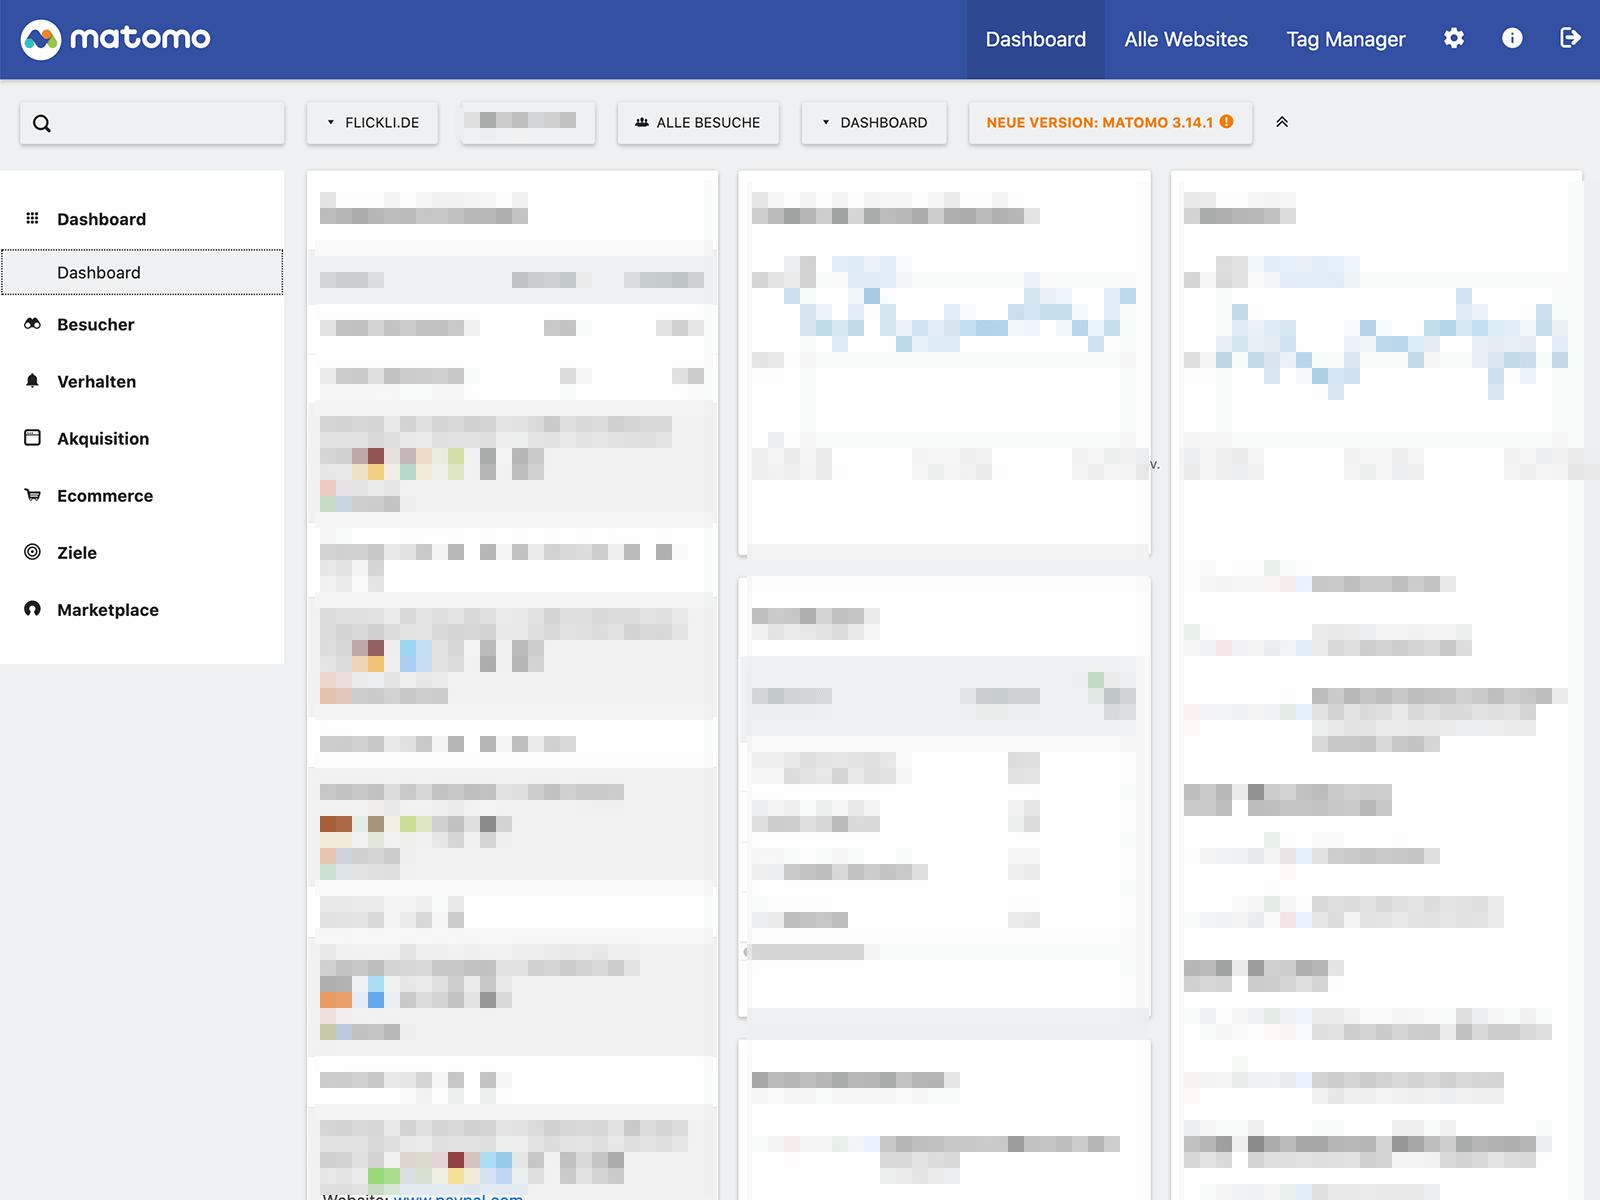 Datenschutz-konforme Matomo-Integration